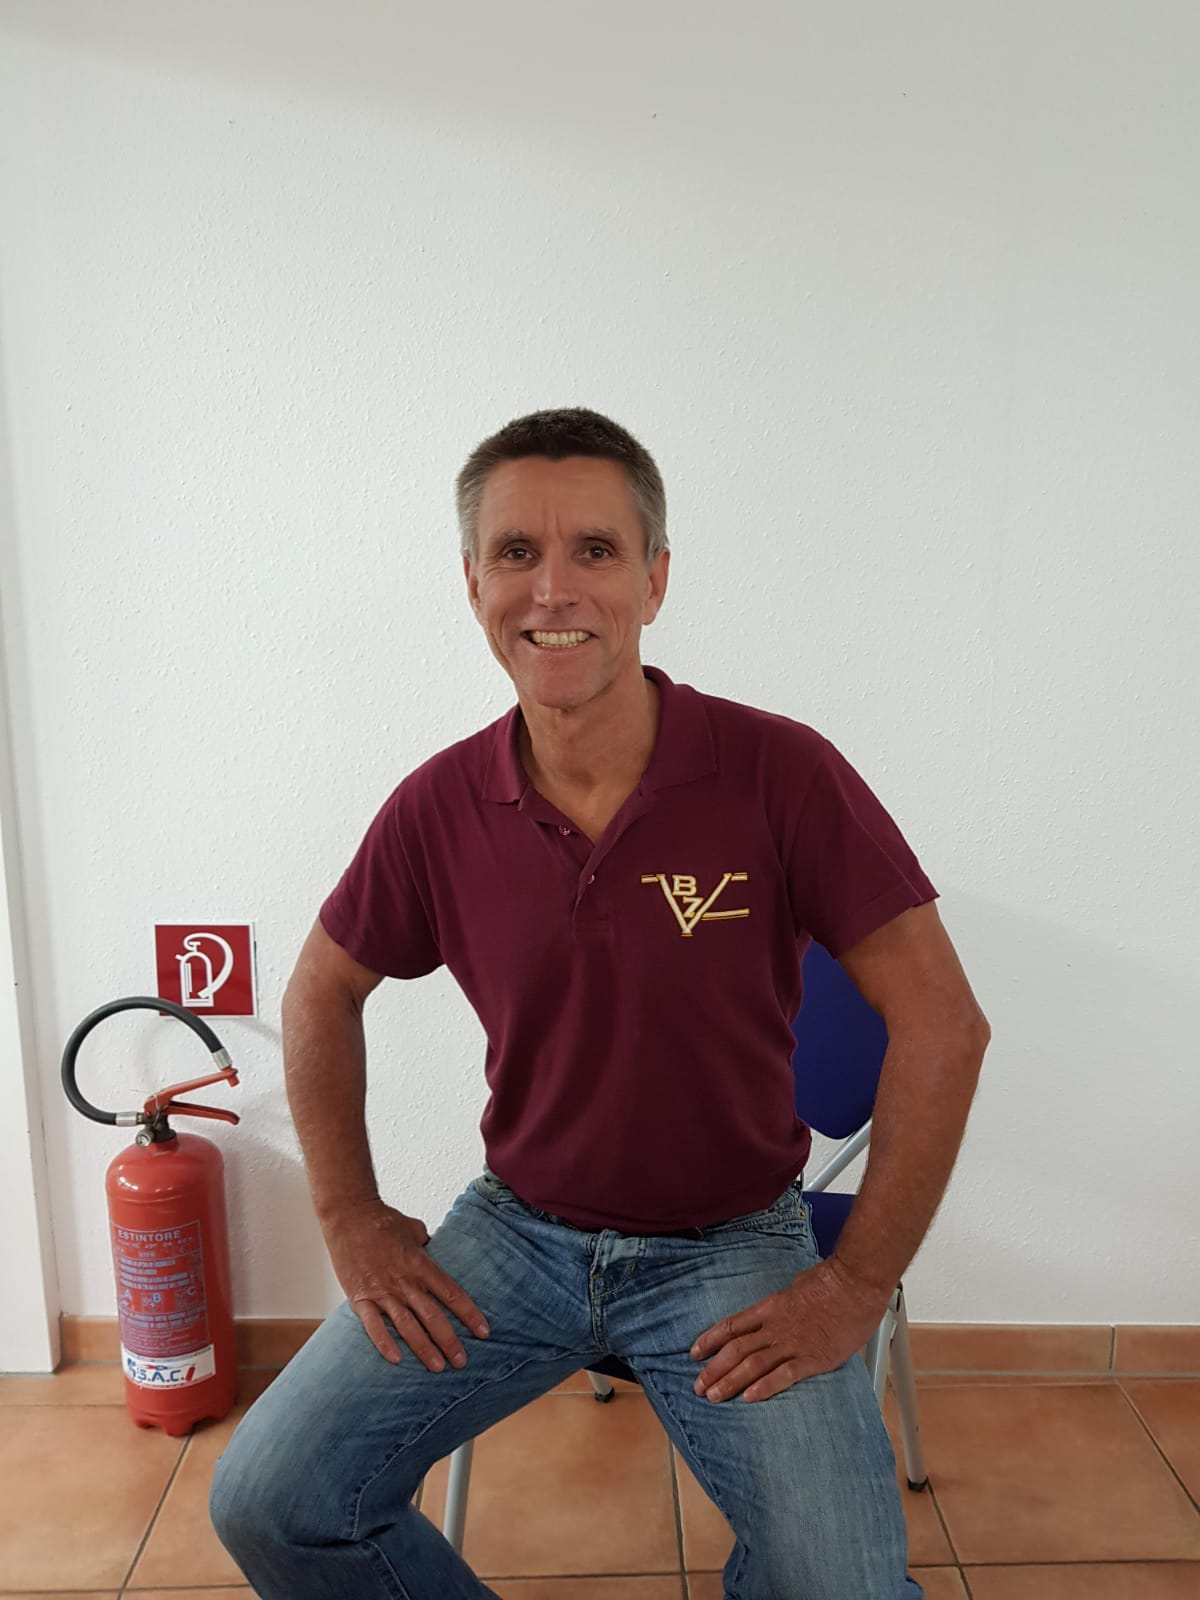 Team VBZ - Christian Jahn